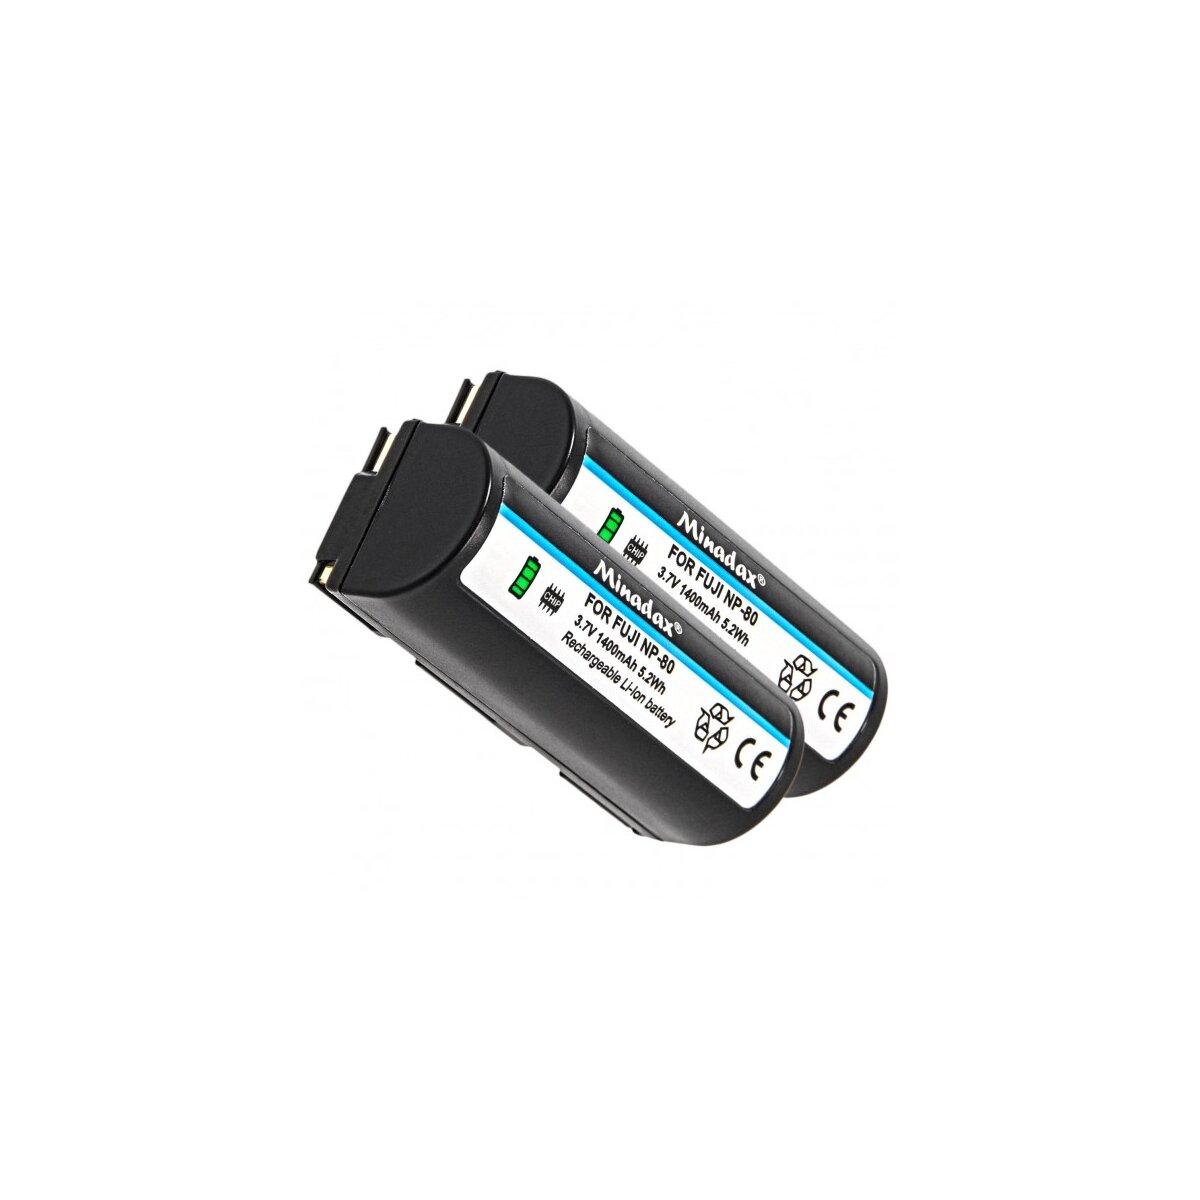 2x Minadax Qualitätsakku mit echten 1400 mAh kompatibel für FujiFilm Finepix 1300 1400 4800 4900 6800 6900 MX1700 MX2700 MX2900 MX600Z, Ersatz für NP-80 - Intelligentes Akkusystem mit Chip